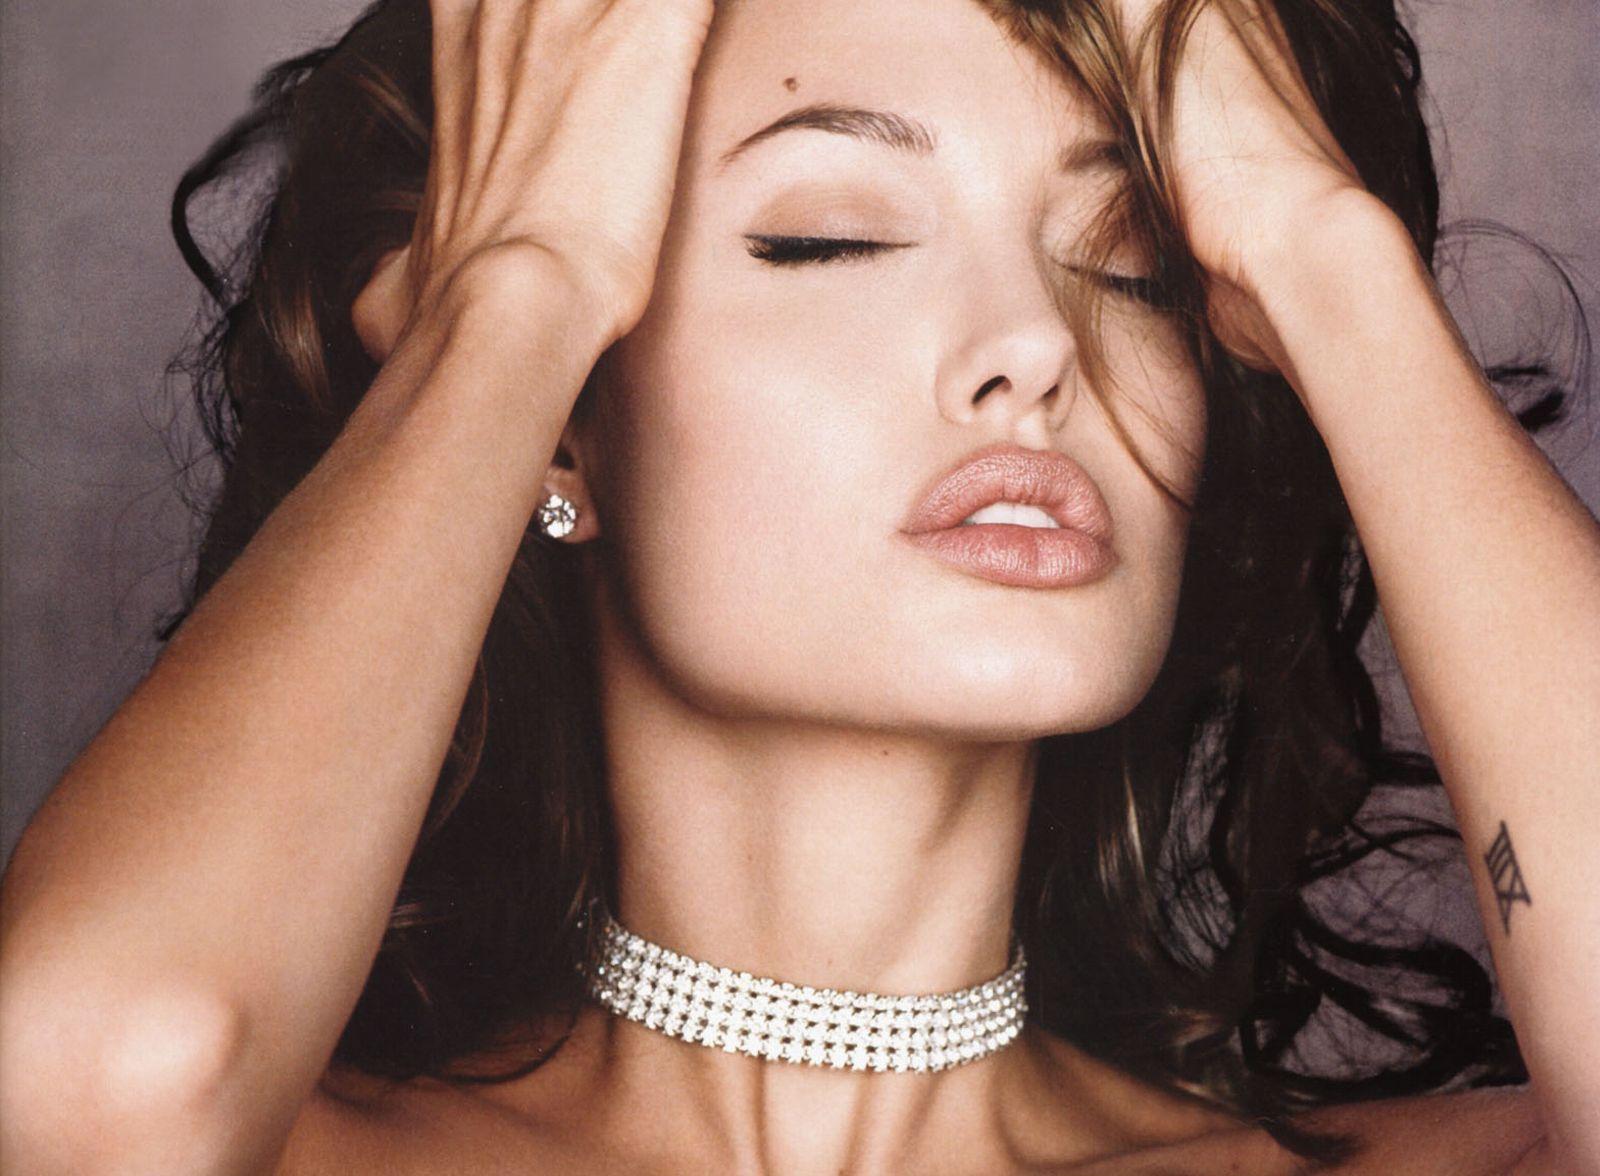 Angelina Jolie Hot And Sexy Pics 3840x2160 angelina jolie hot expression pics 4k wallpaper